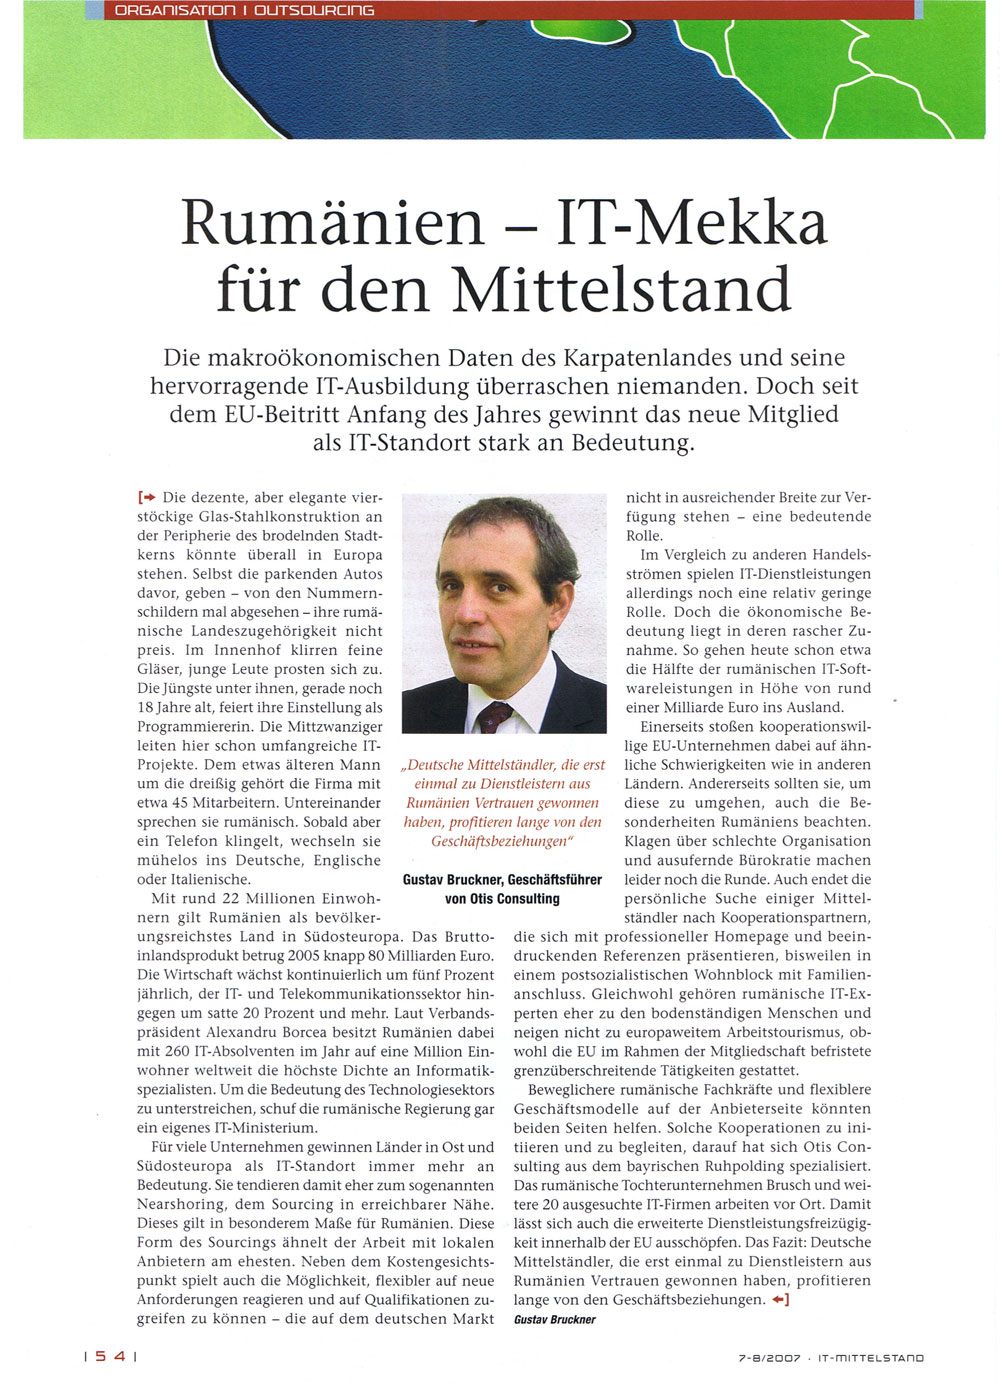 IT-Mittelstand_Mekka_Ru_Gastartikel_Bruckner-30-07-07